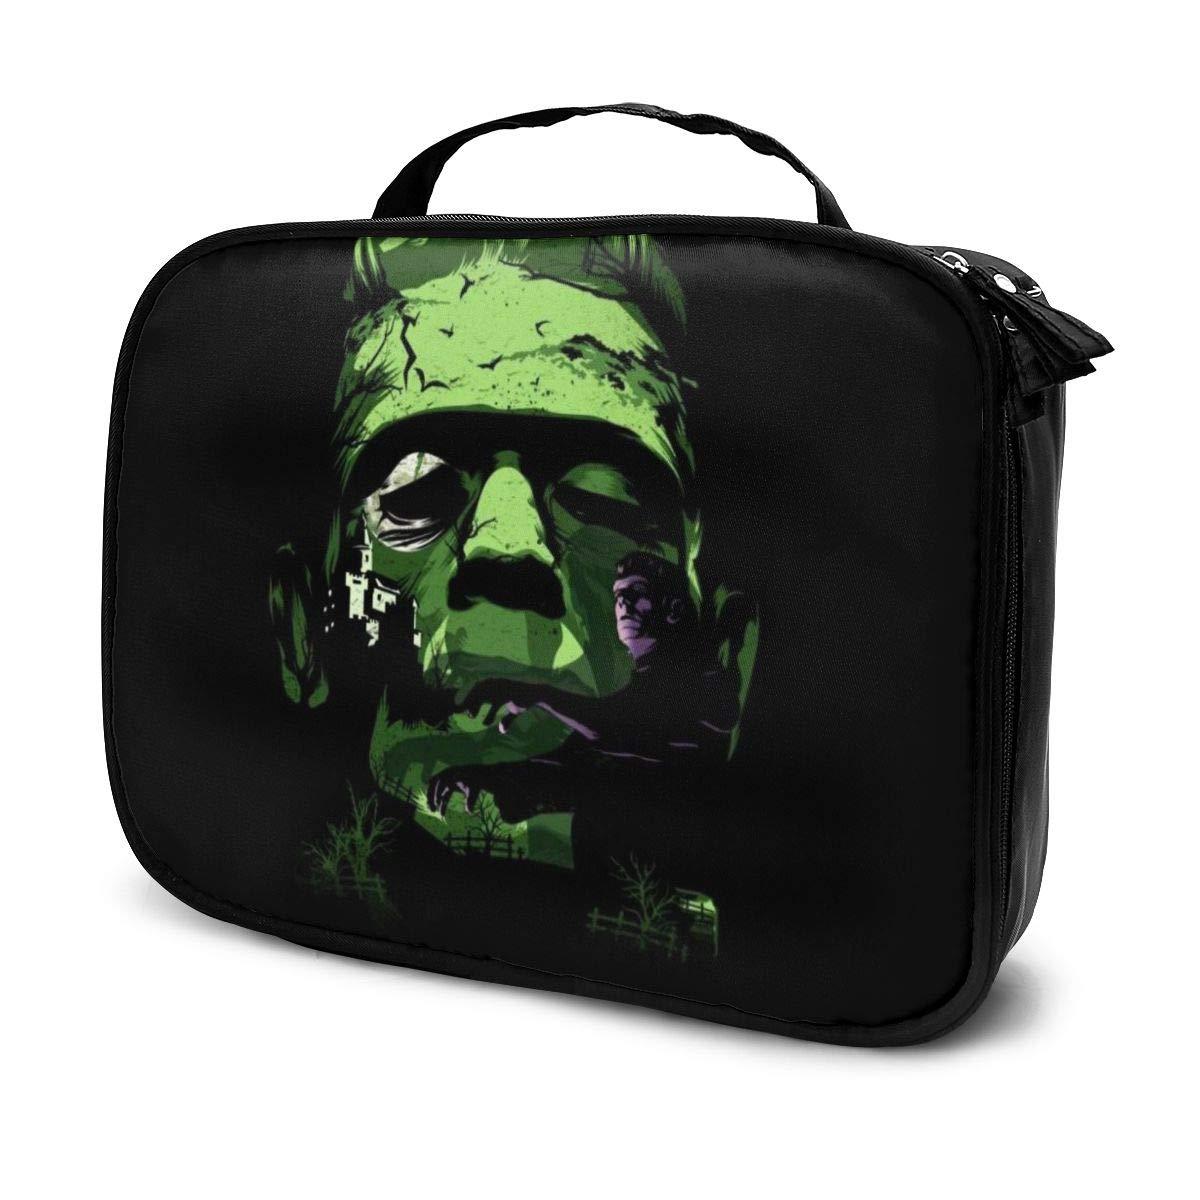 Makeup Bag Cosmetic Pouch Frankensteins Monster Multi-Functional Bag Travel Kit